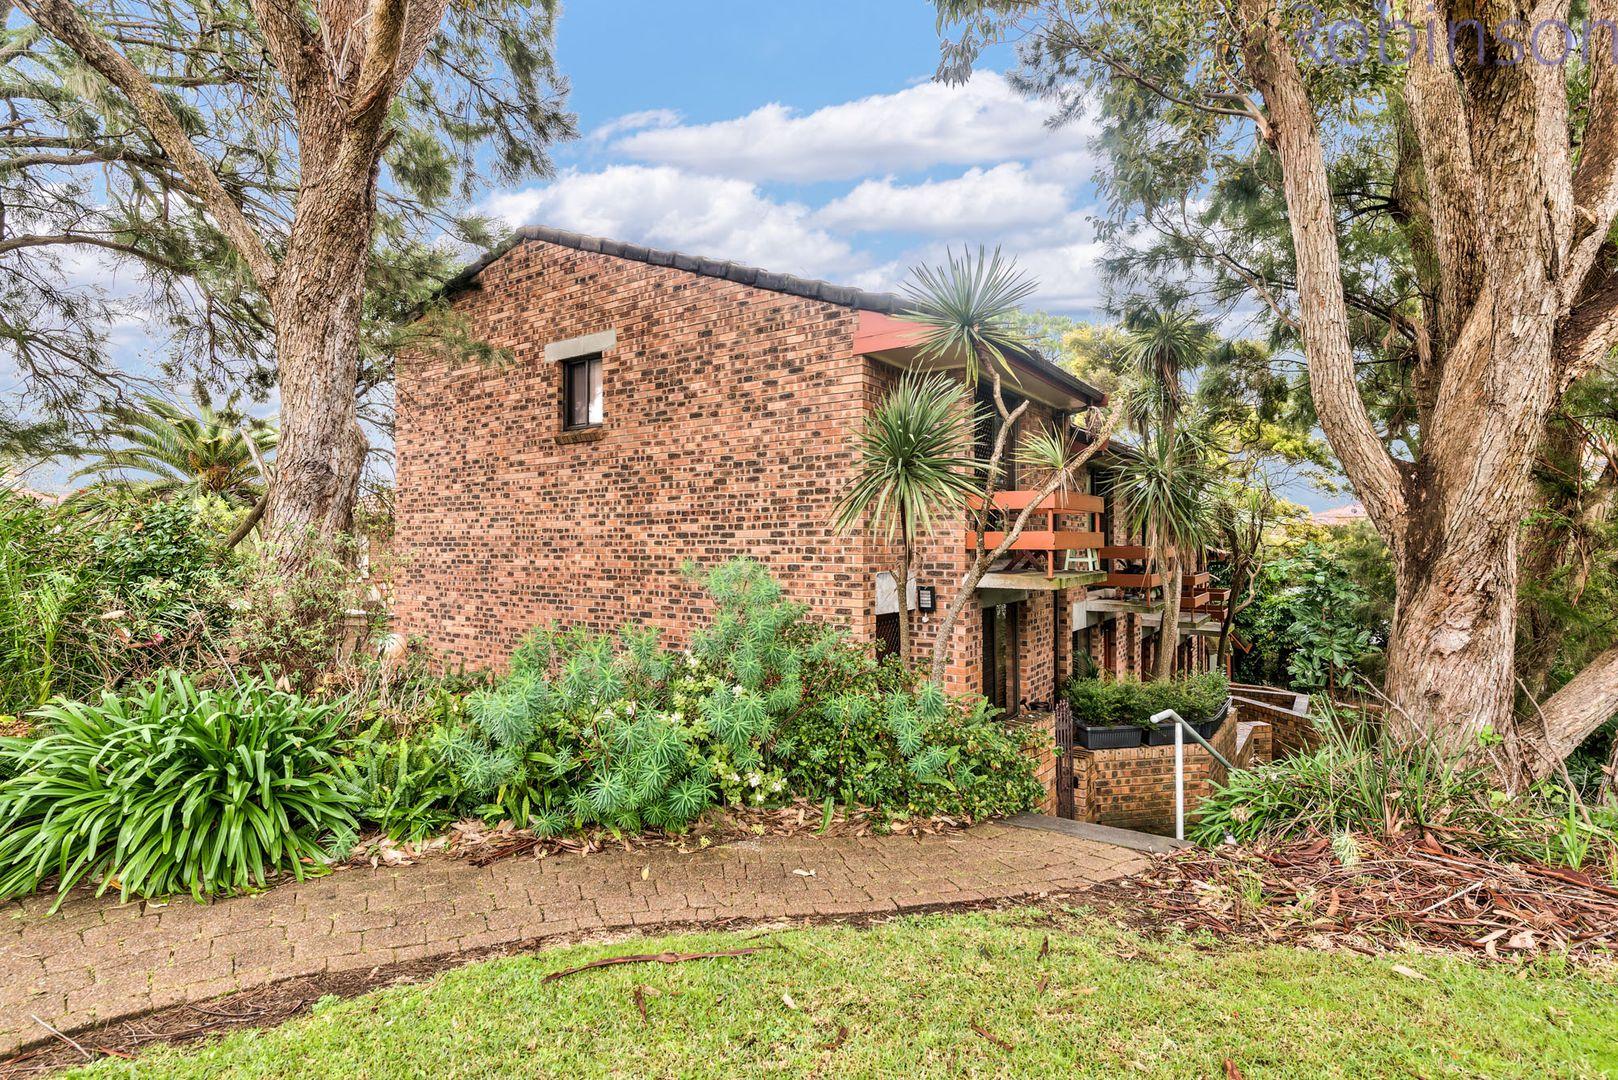 5/18 Mosbri Crescent, The Hill NSW 2300